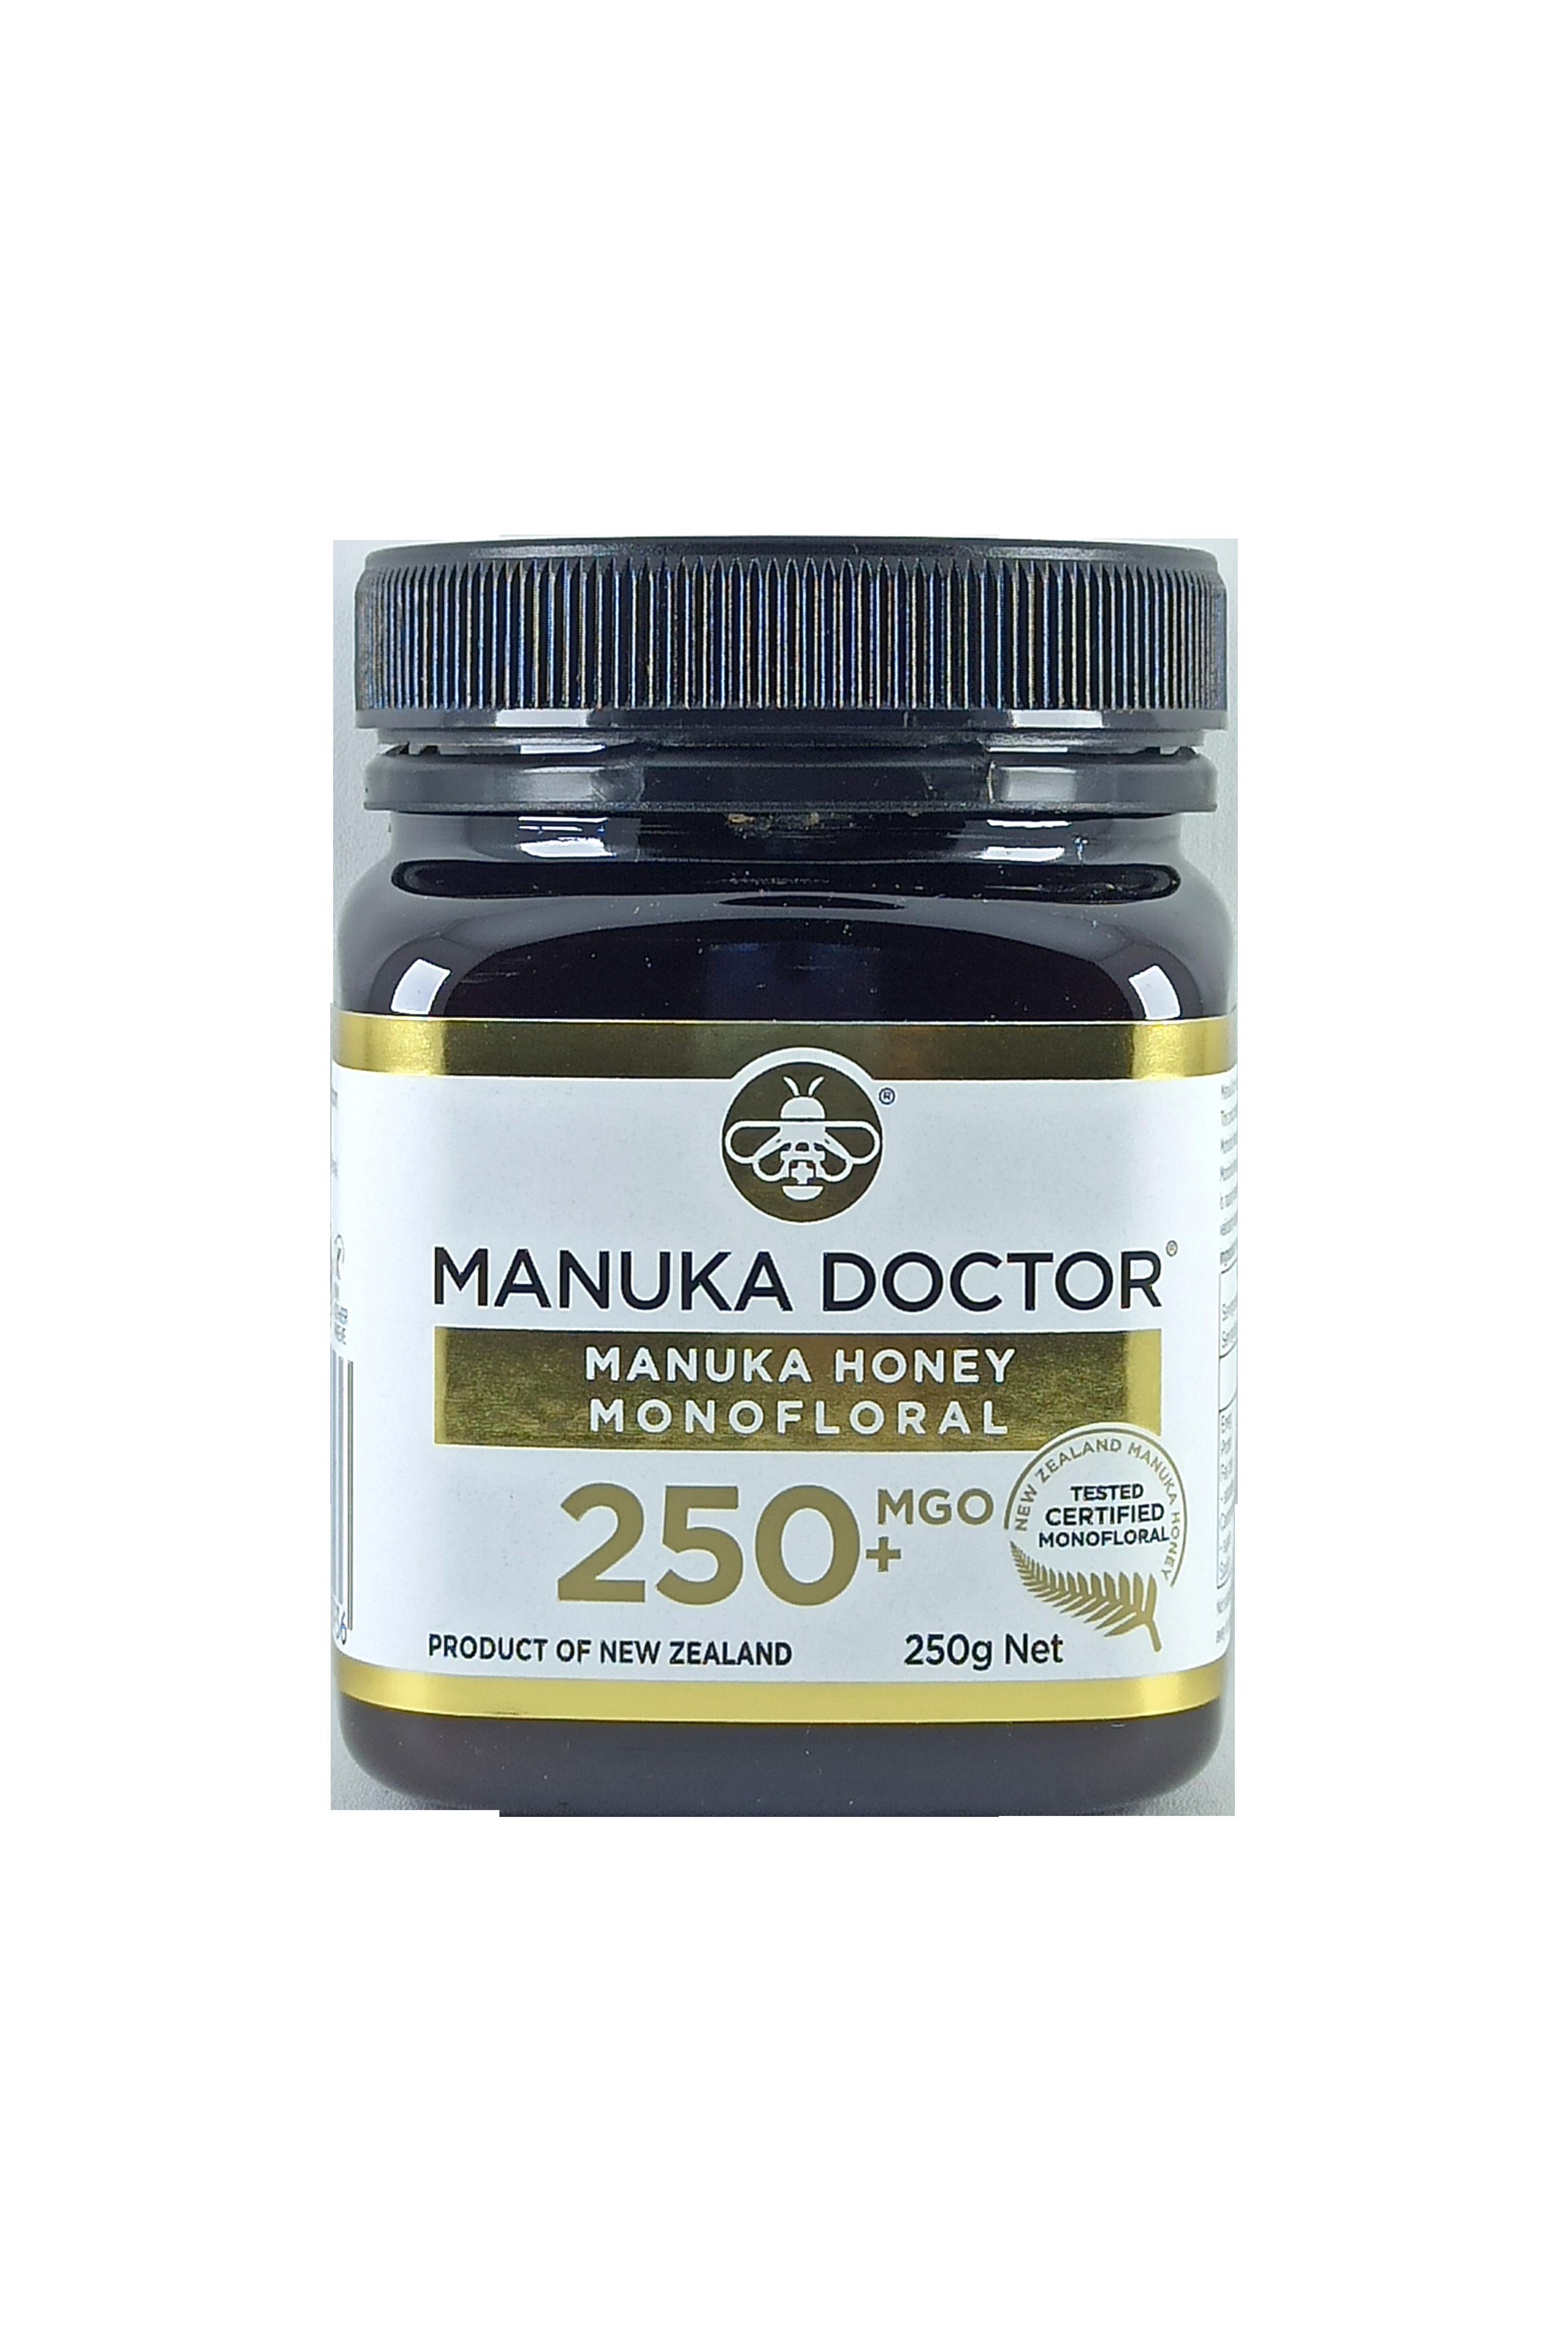 Manuka Doctor MGO 250+ Manuka Honey Monofloral 250gr